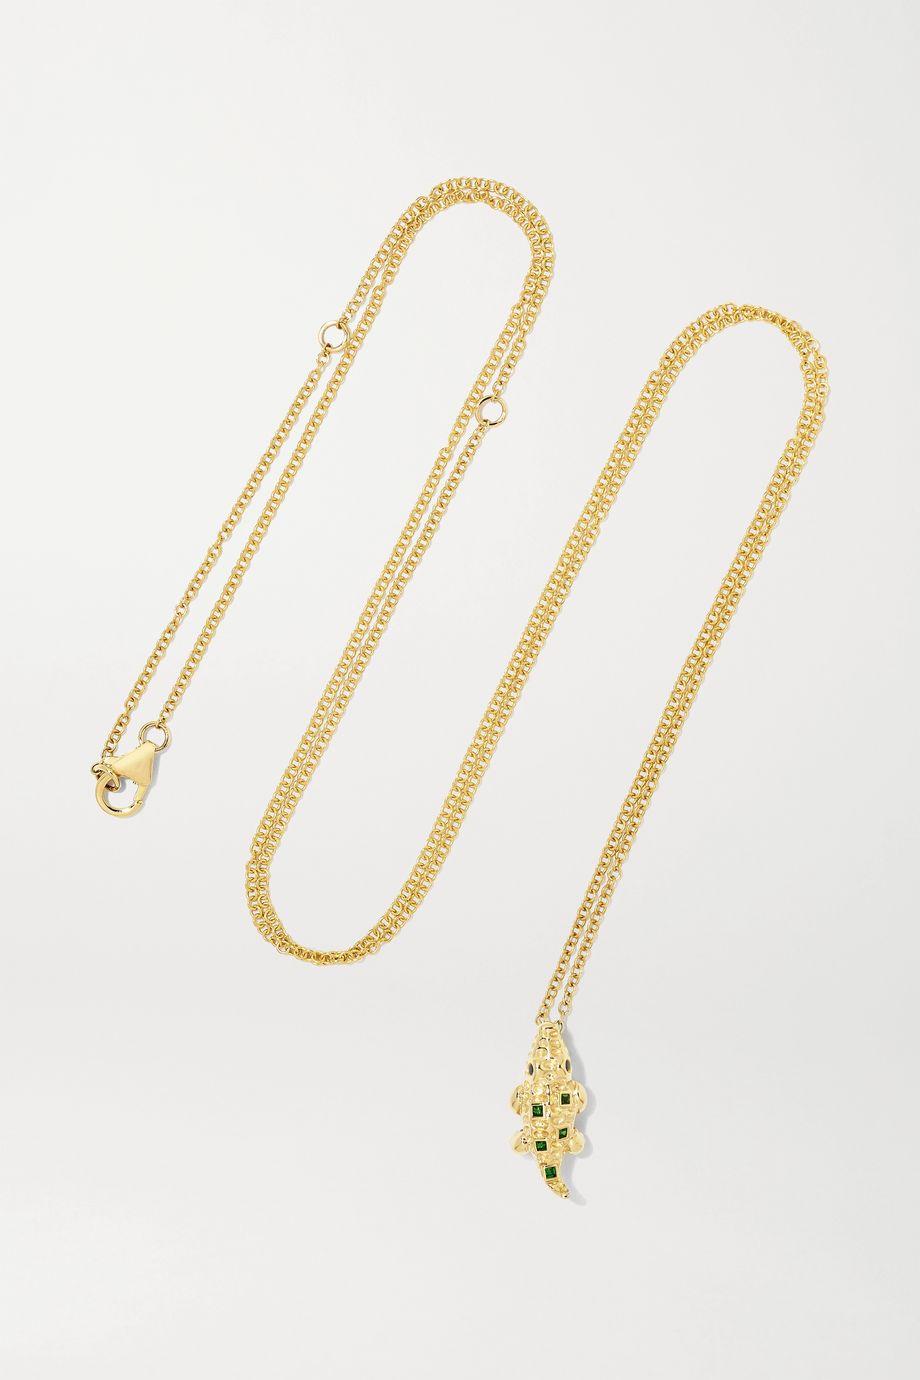 Yvonne Léon 9-karat gold, tsavorite and diamond necklace